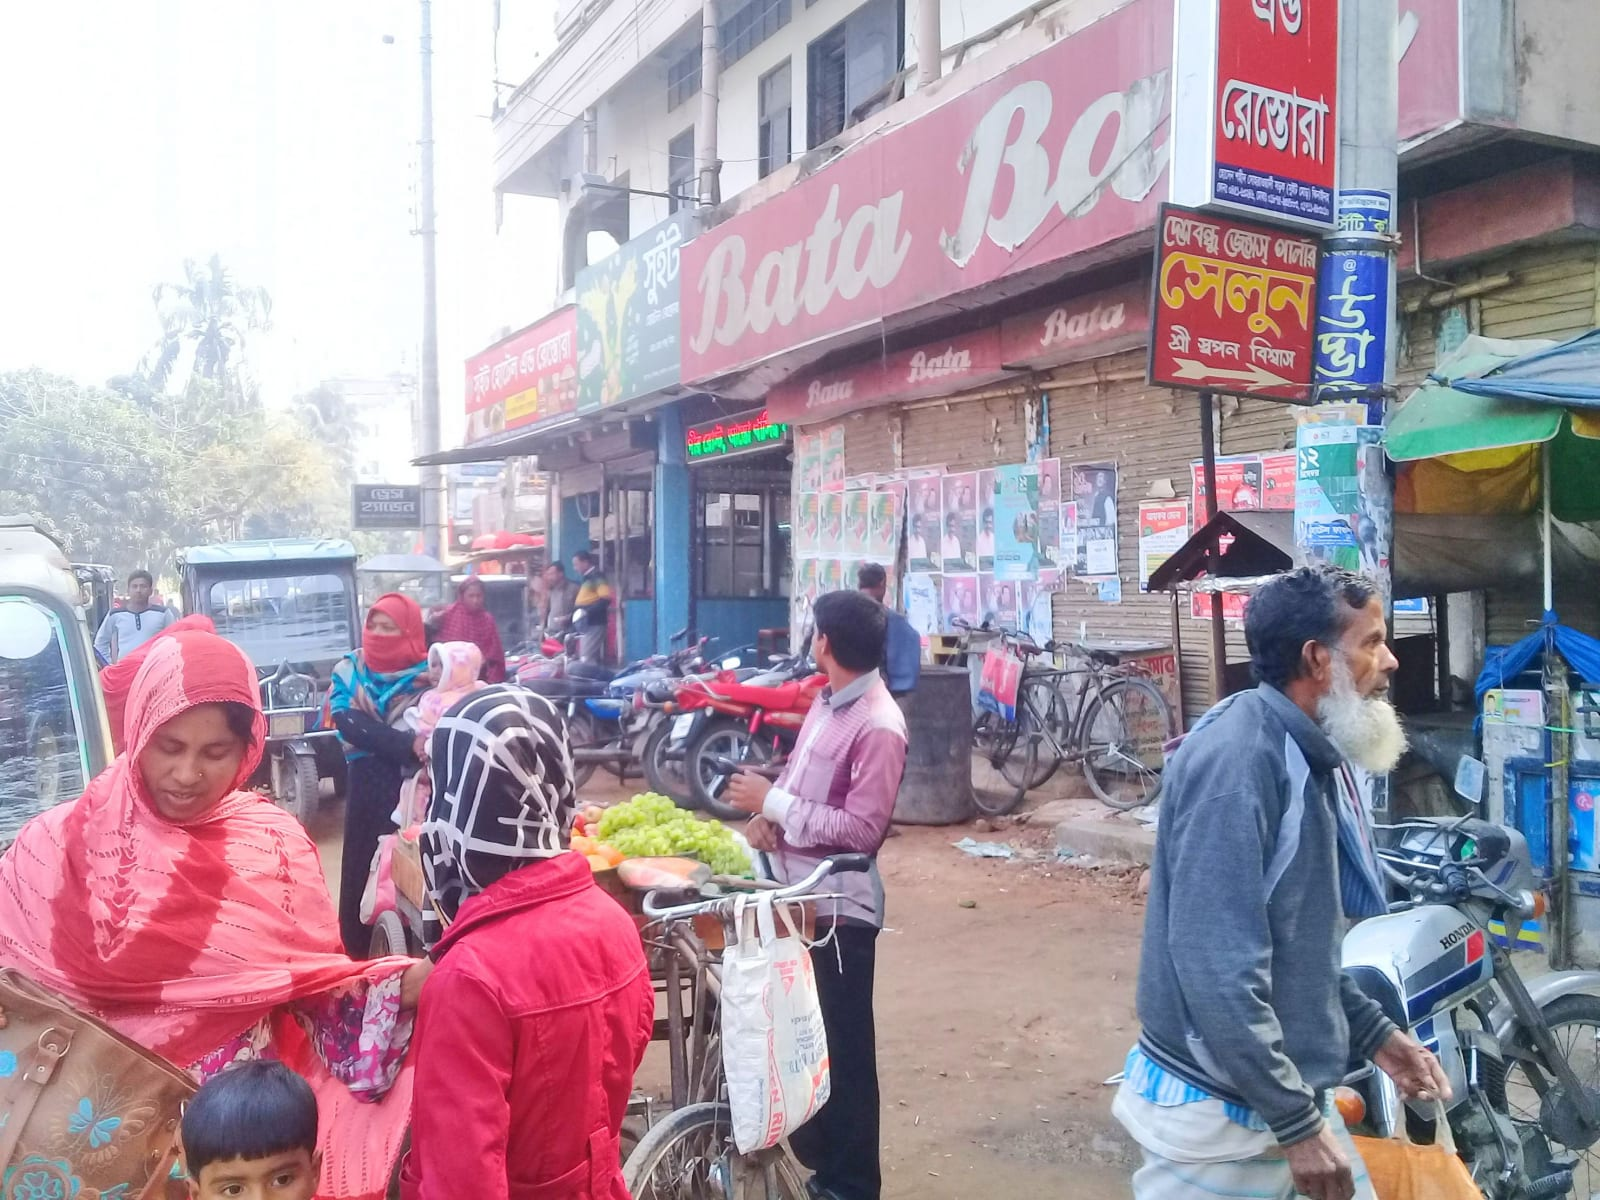 Oblíbený Baťa, Dháka, Bangladéš